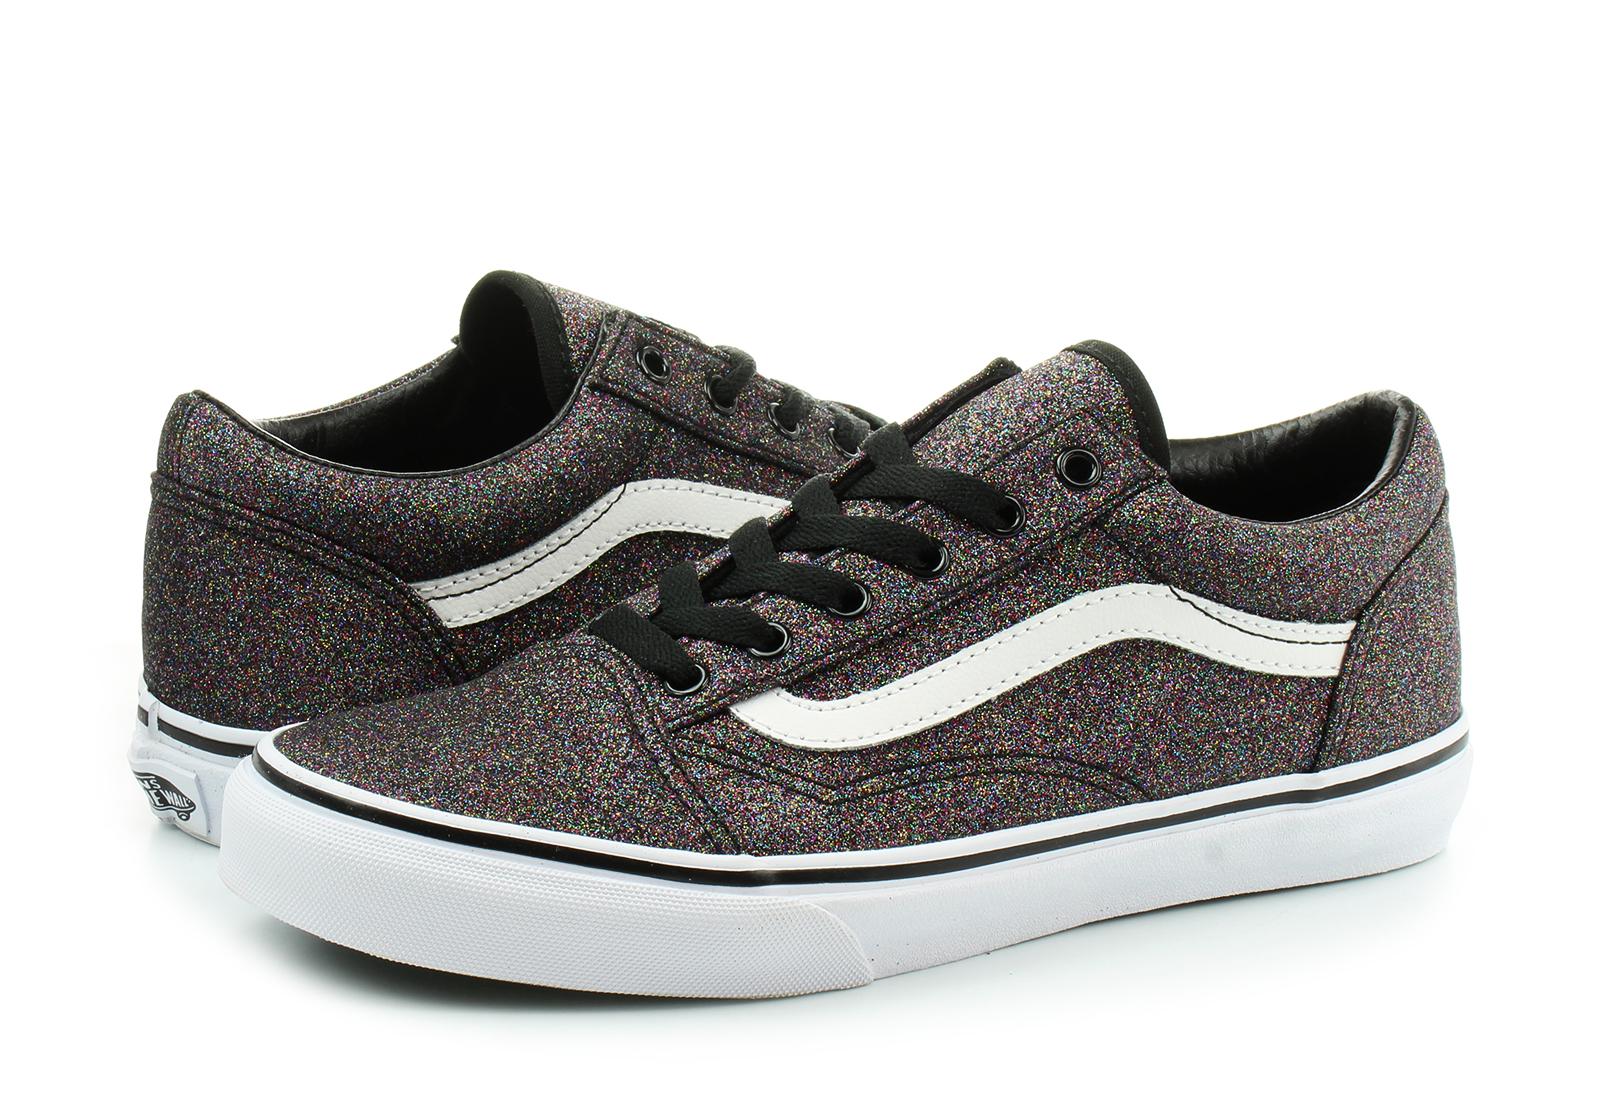 Vans Tenisi - Old Skool K - VA38HBQ7E - Office Shoes Romania 142e6c7952